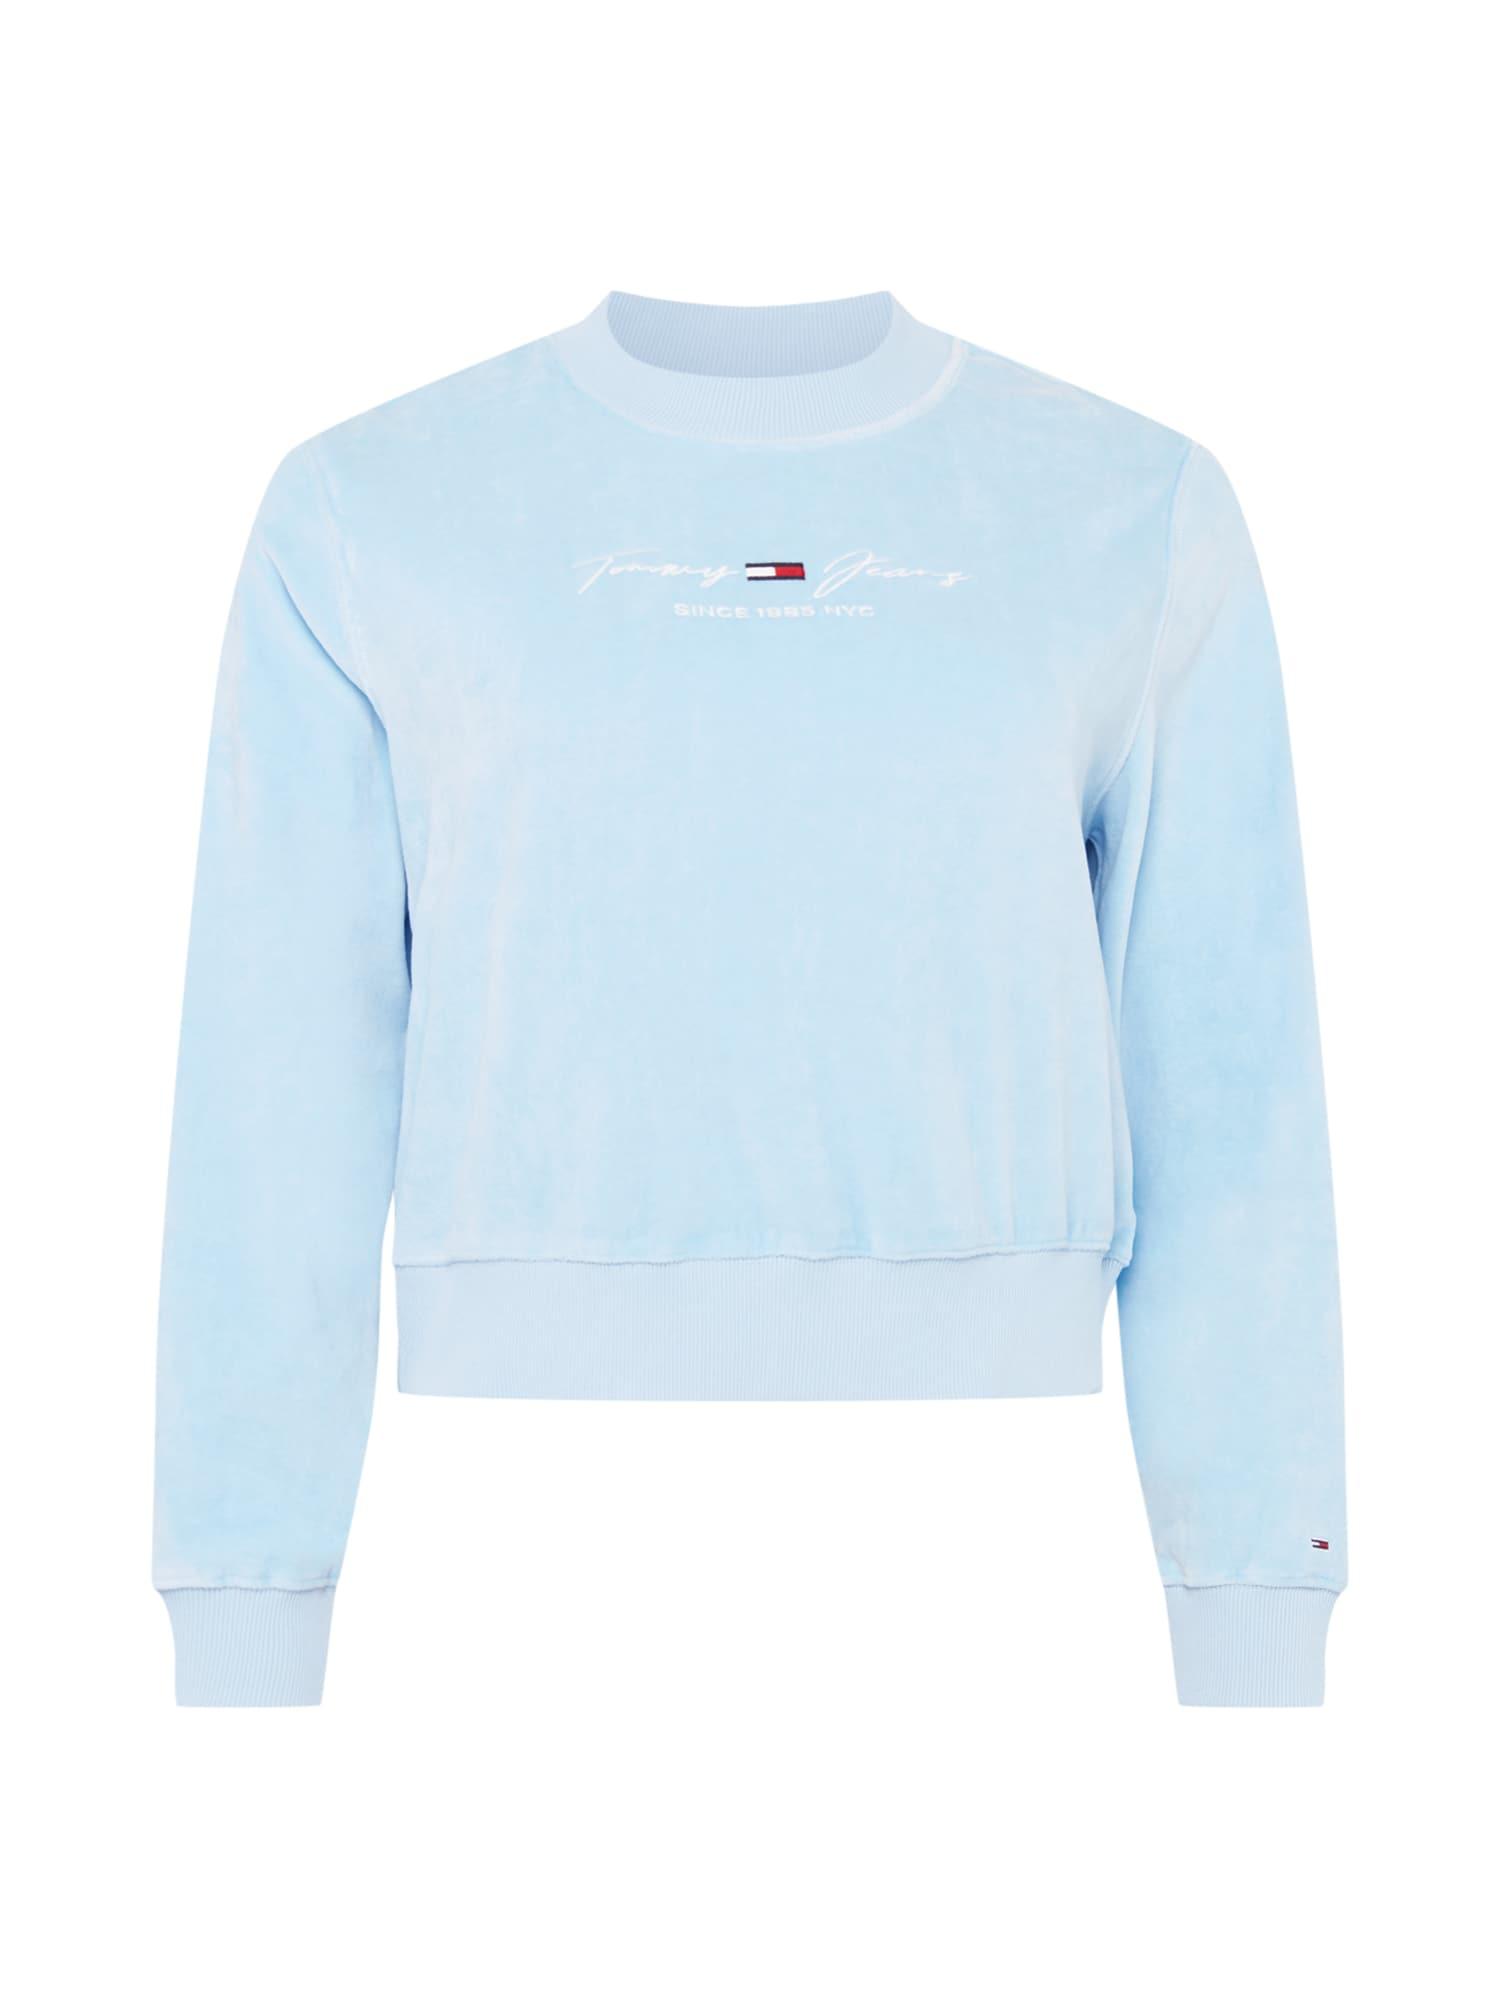 Tommy Jeans Curve Megztinis be užsegimo pastelinė mėlyna / balta / tamsiai mėlyna jūros spalva / raudona